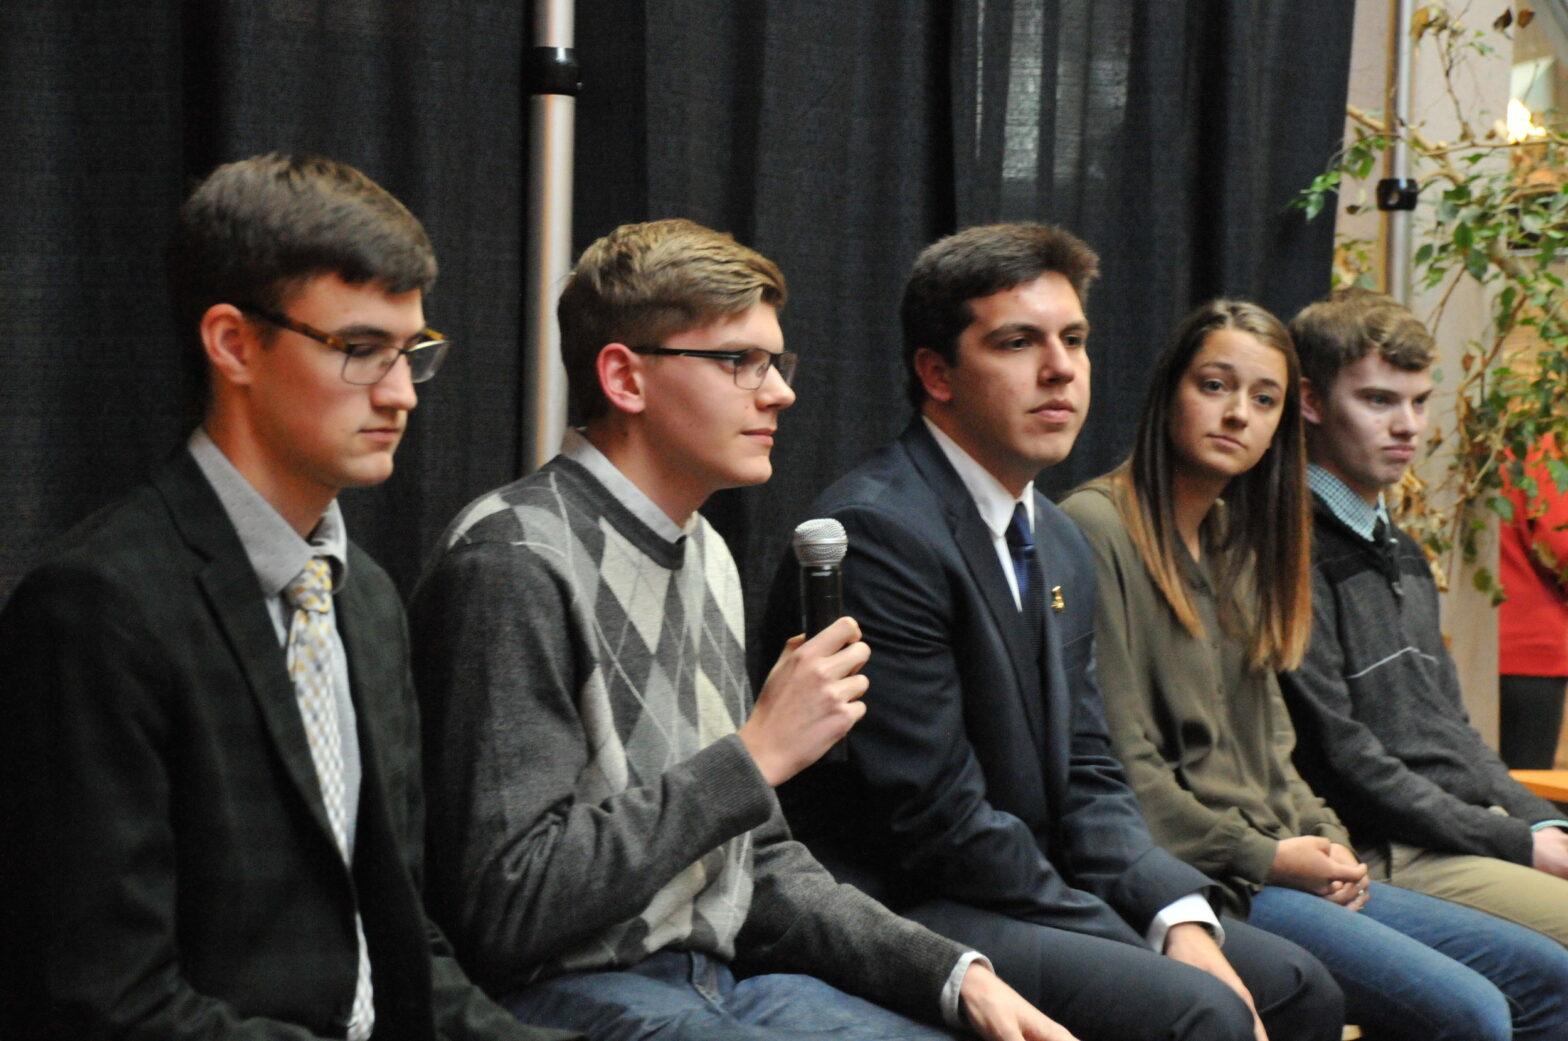 Whitworthian endorses ASWU 2017 executive candidates